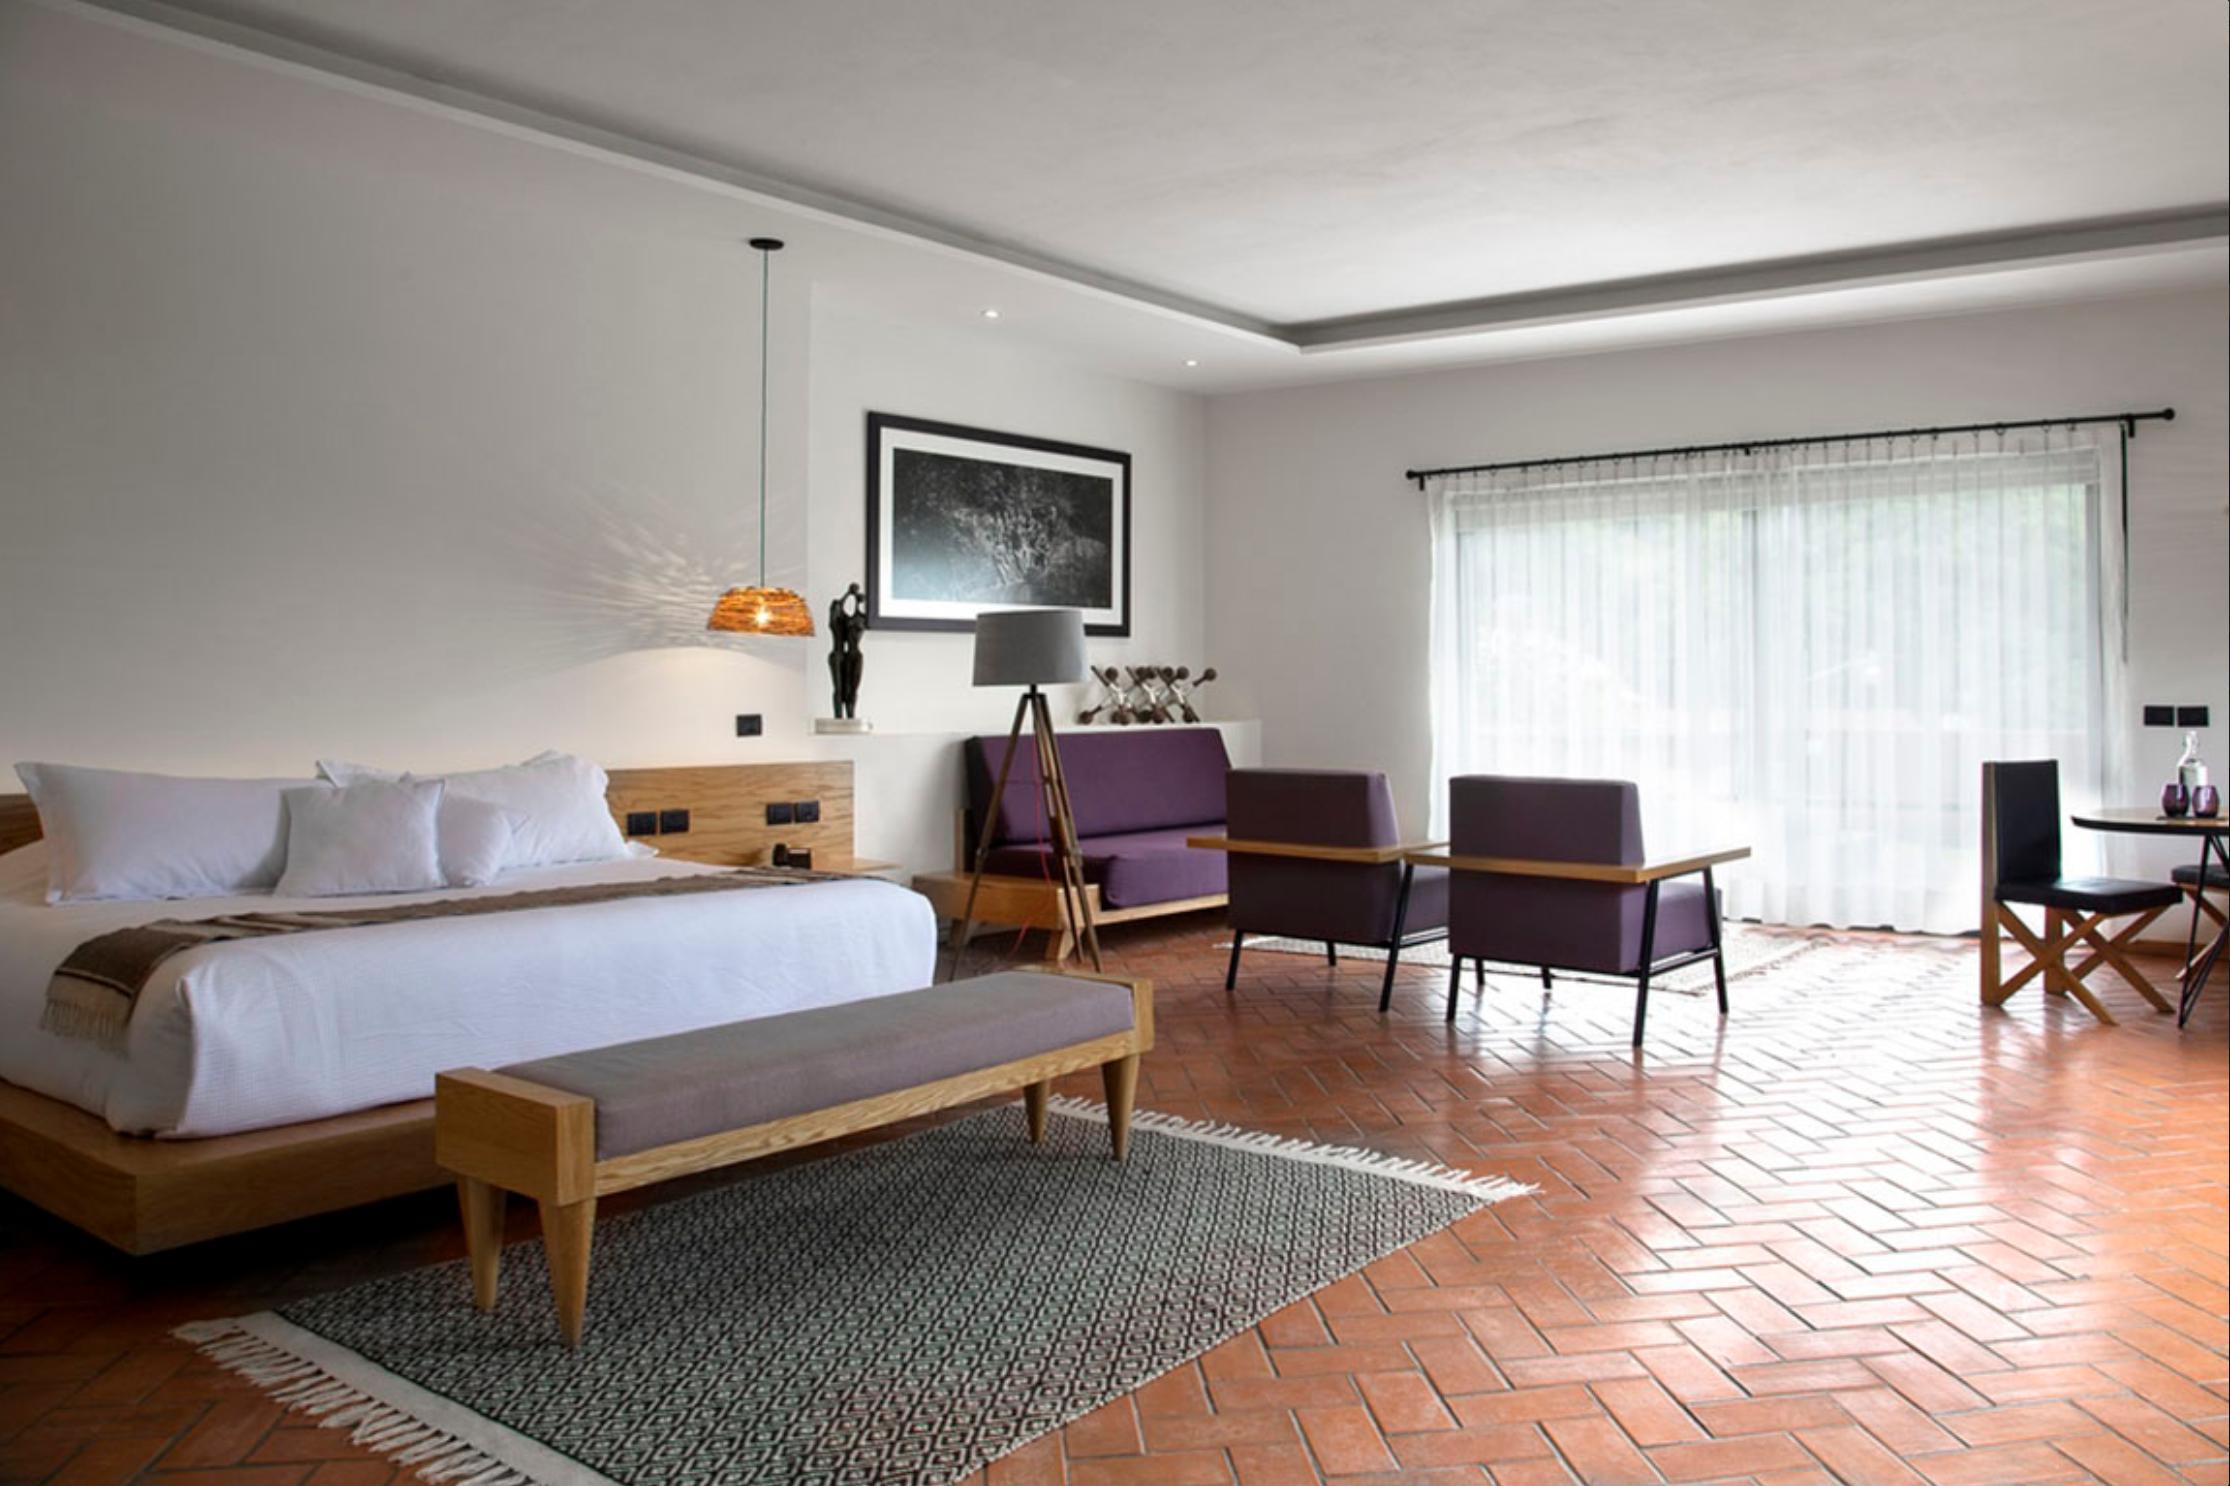 CASA FERNANDA HOTEL & SPA